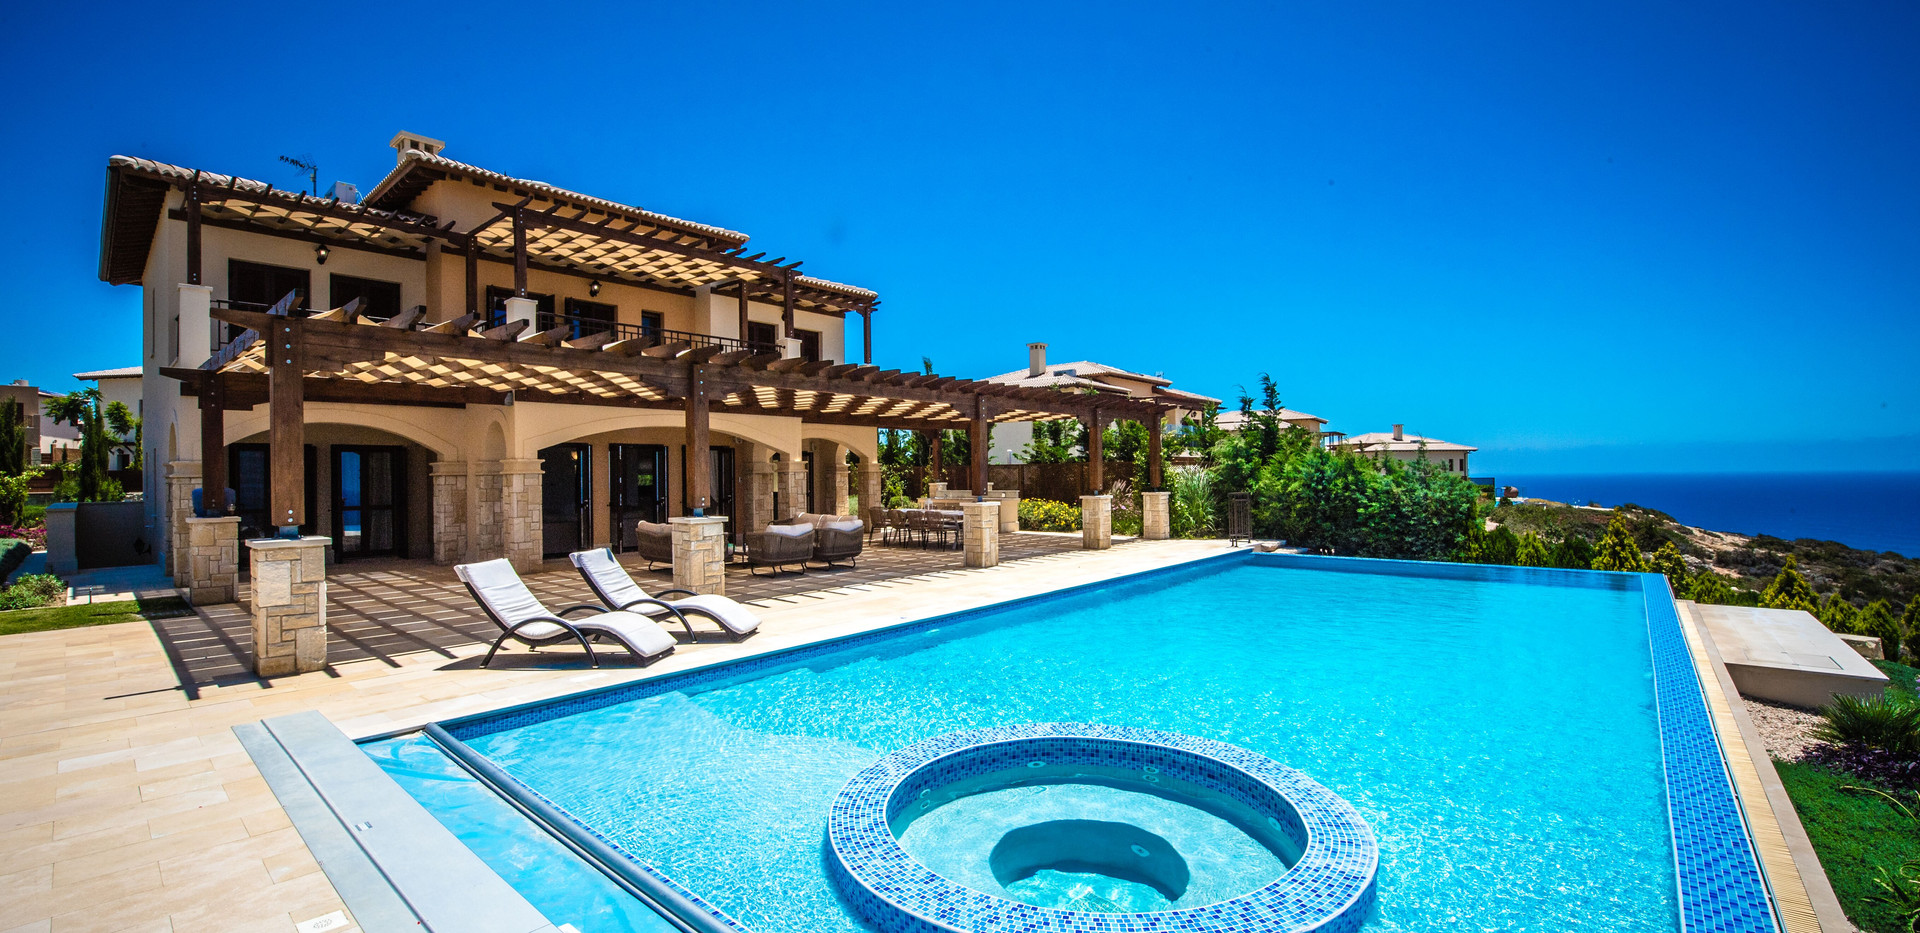 Aphrodite hills villa buy propery.jpeg